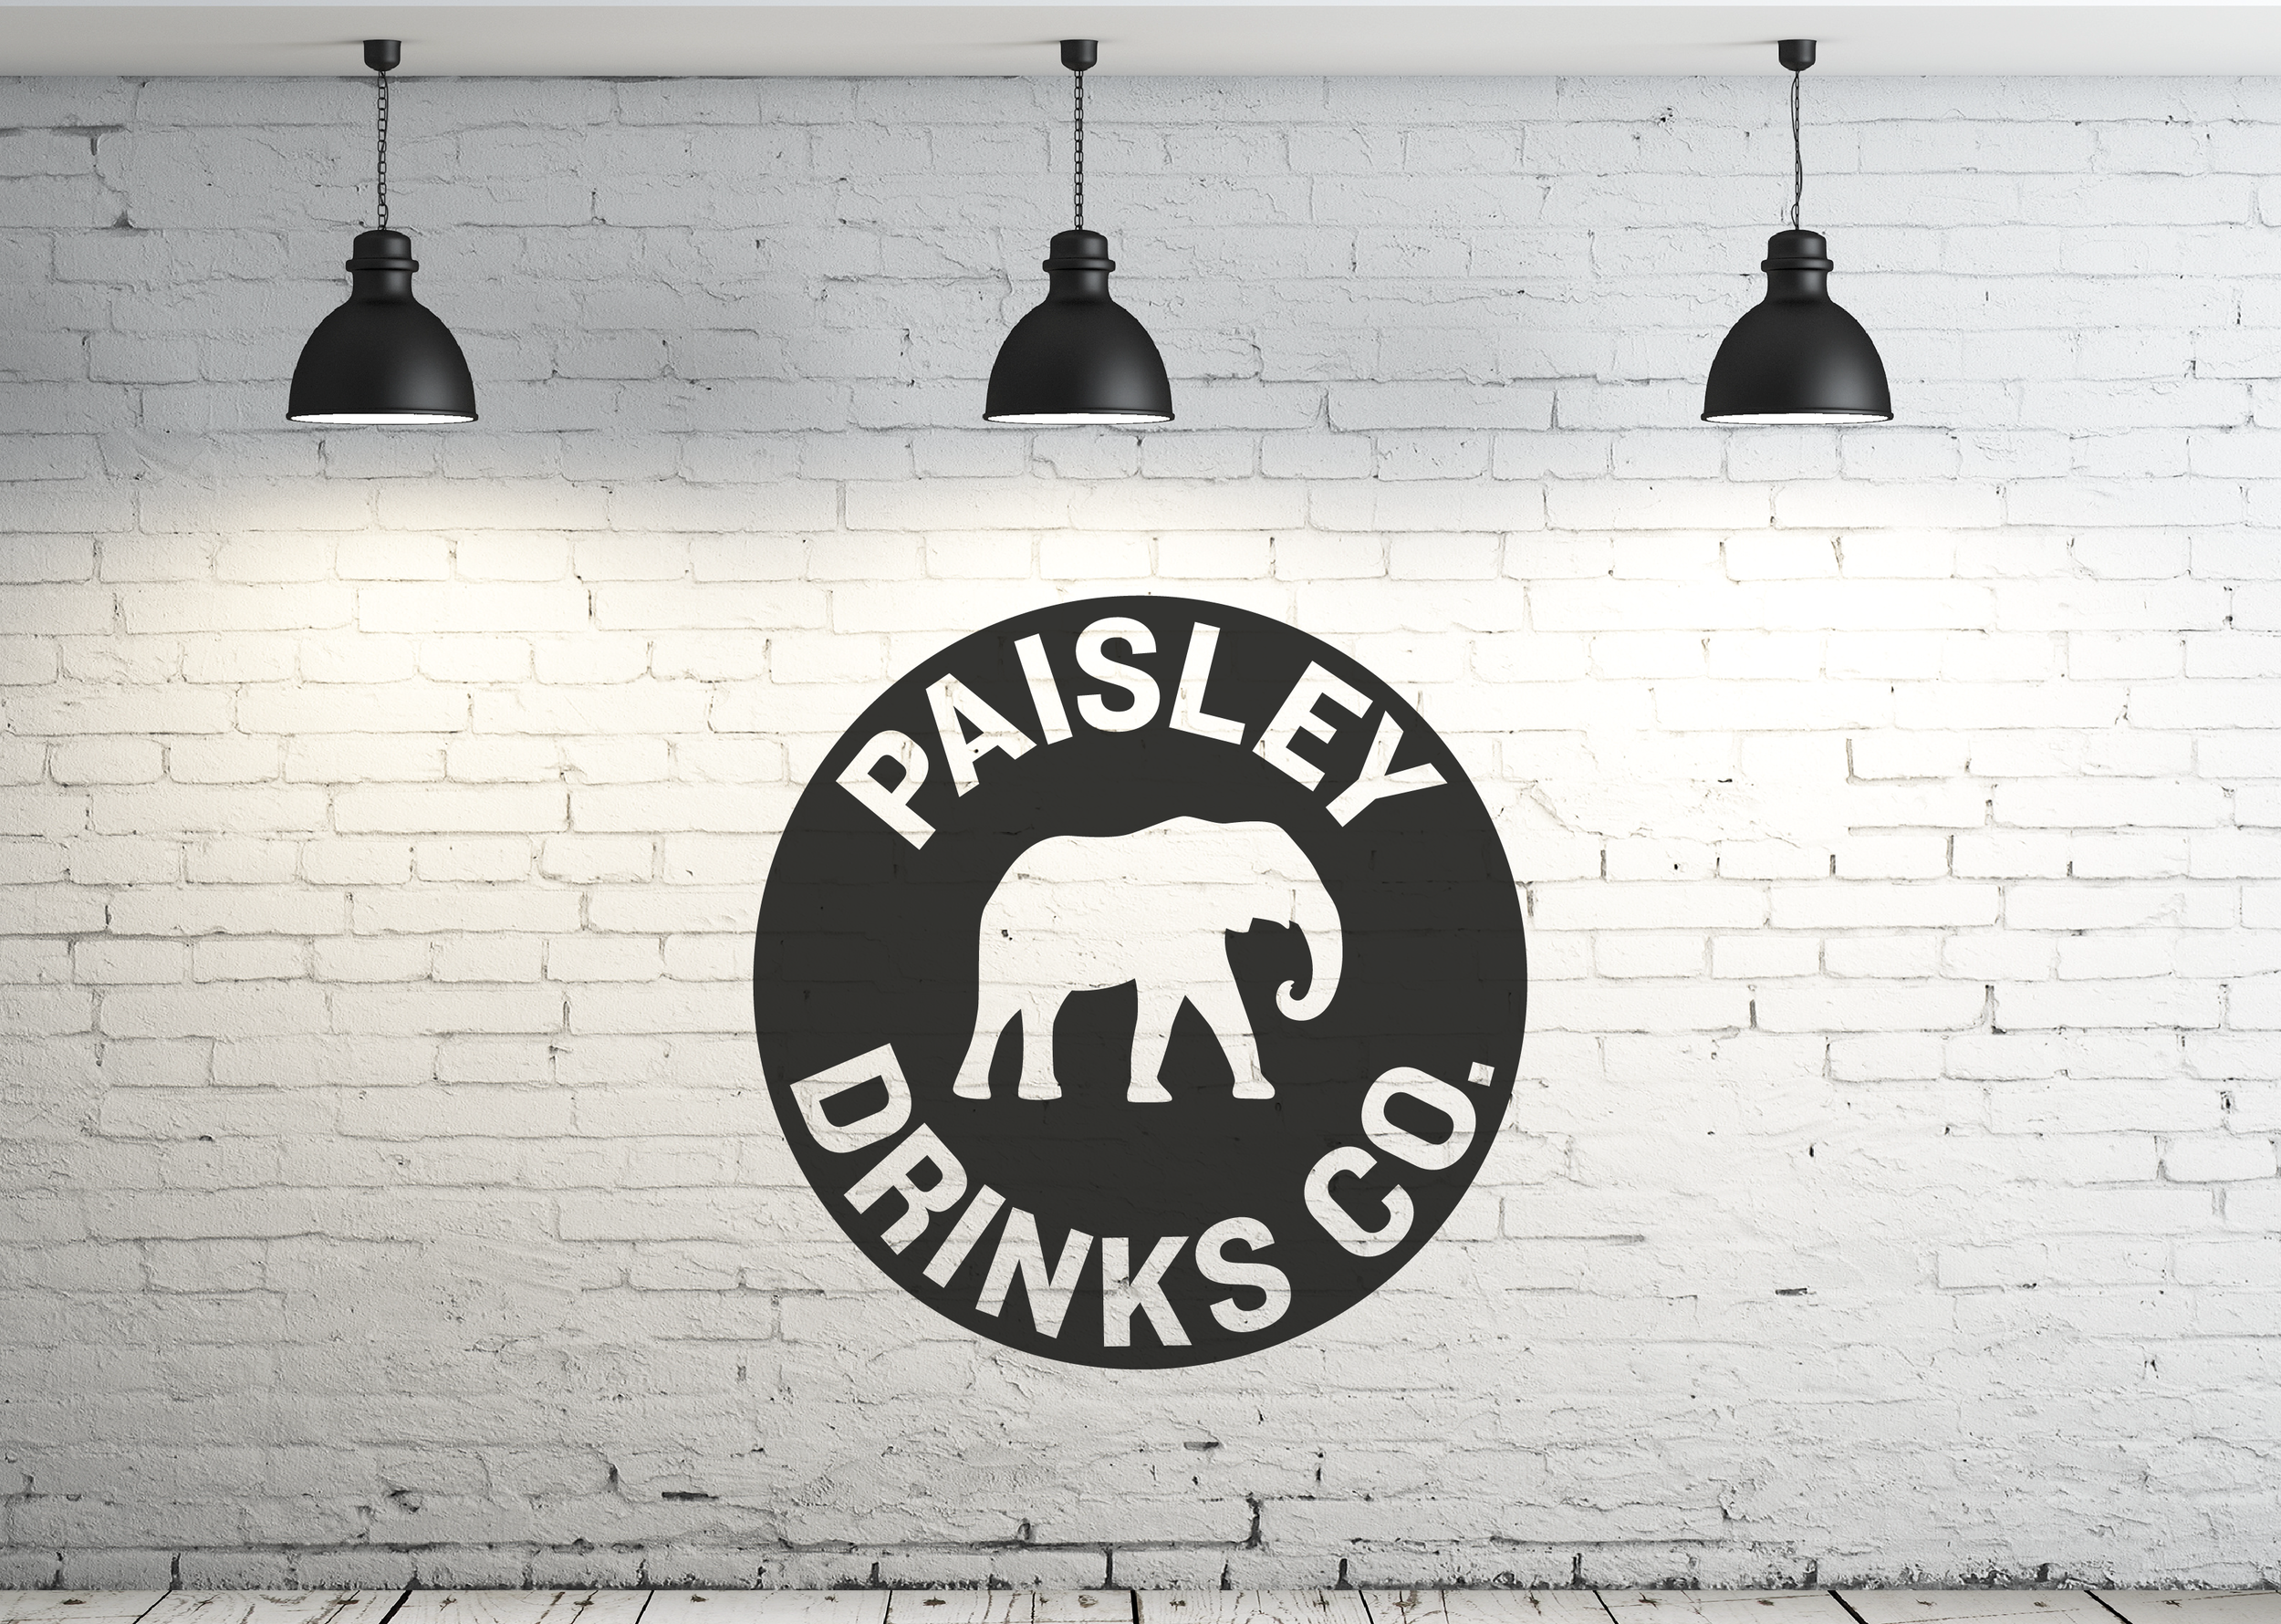 paisleydrinkscompany.com